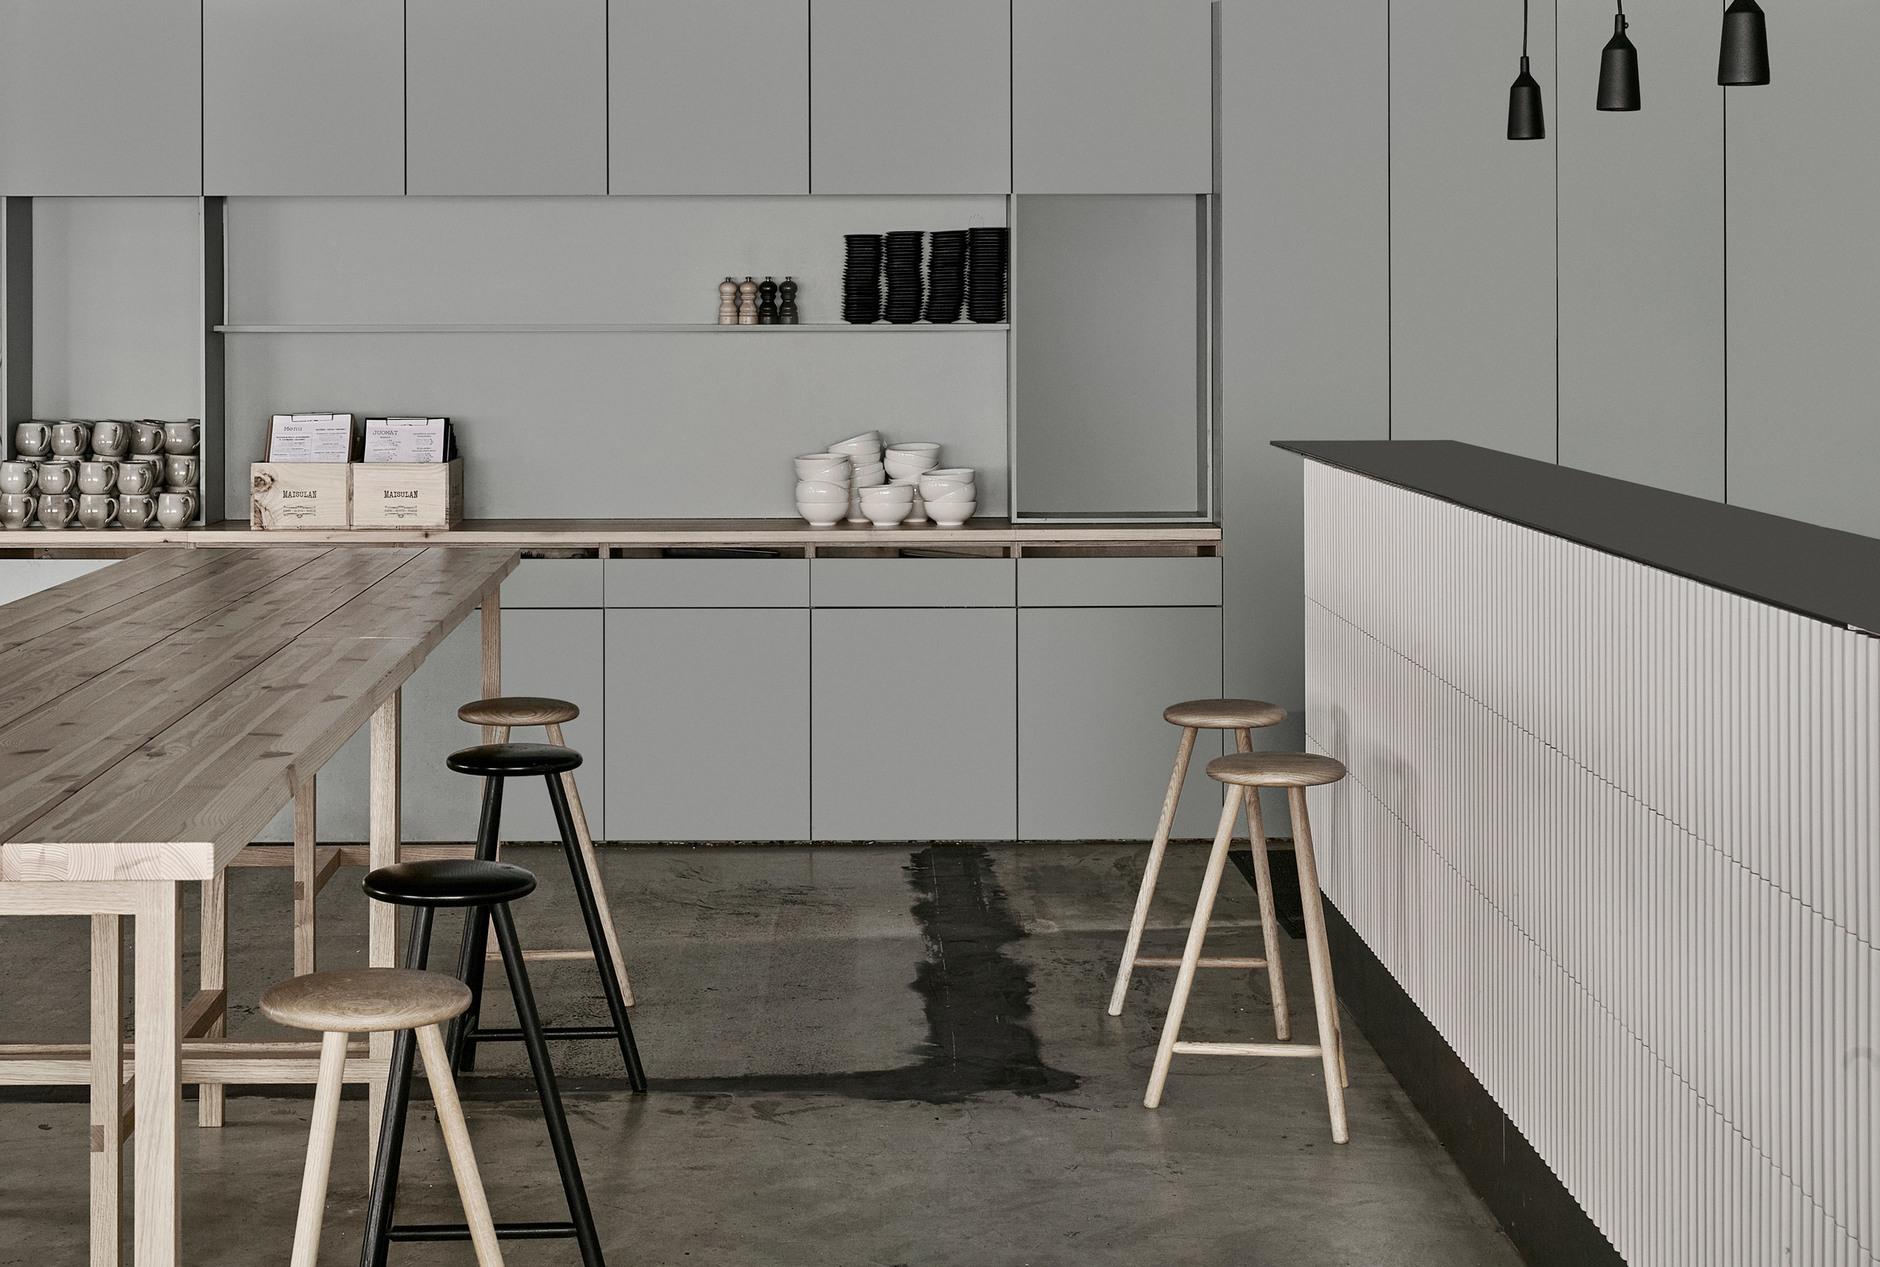 Дуб, бетон и скандинавский дизайн: сауна по проекту Studio Puisto (галерея 4, фото 3)